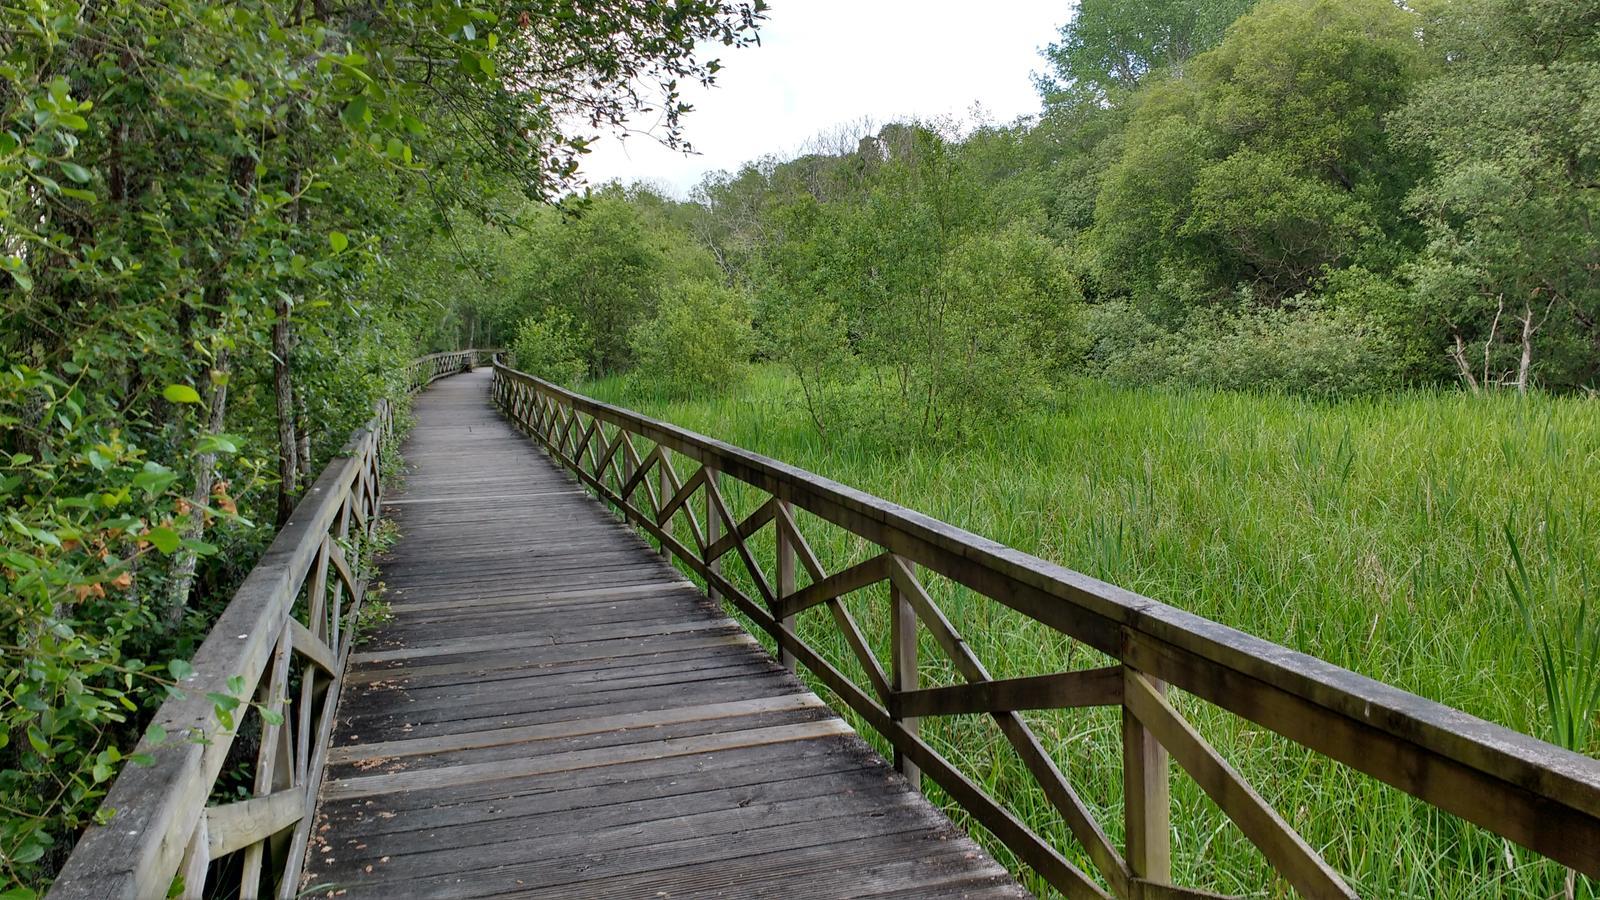 Fotografía de las pasarelas del Humedal da Xunqueira, Ares